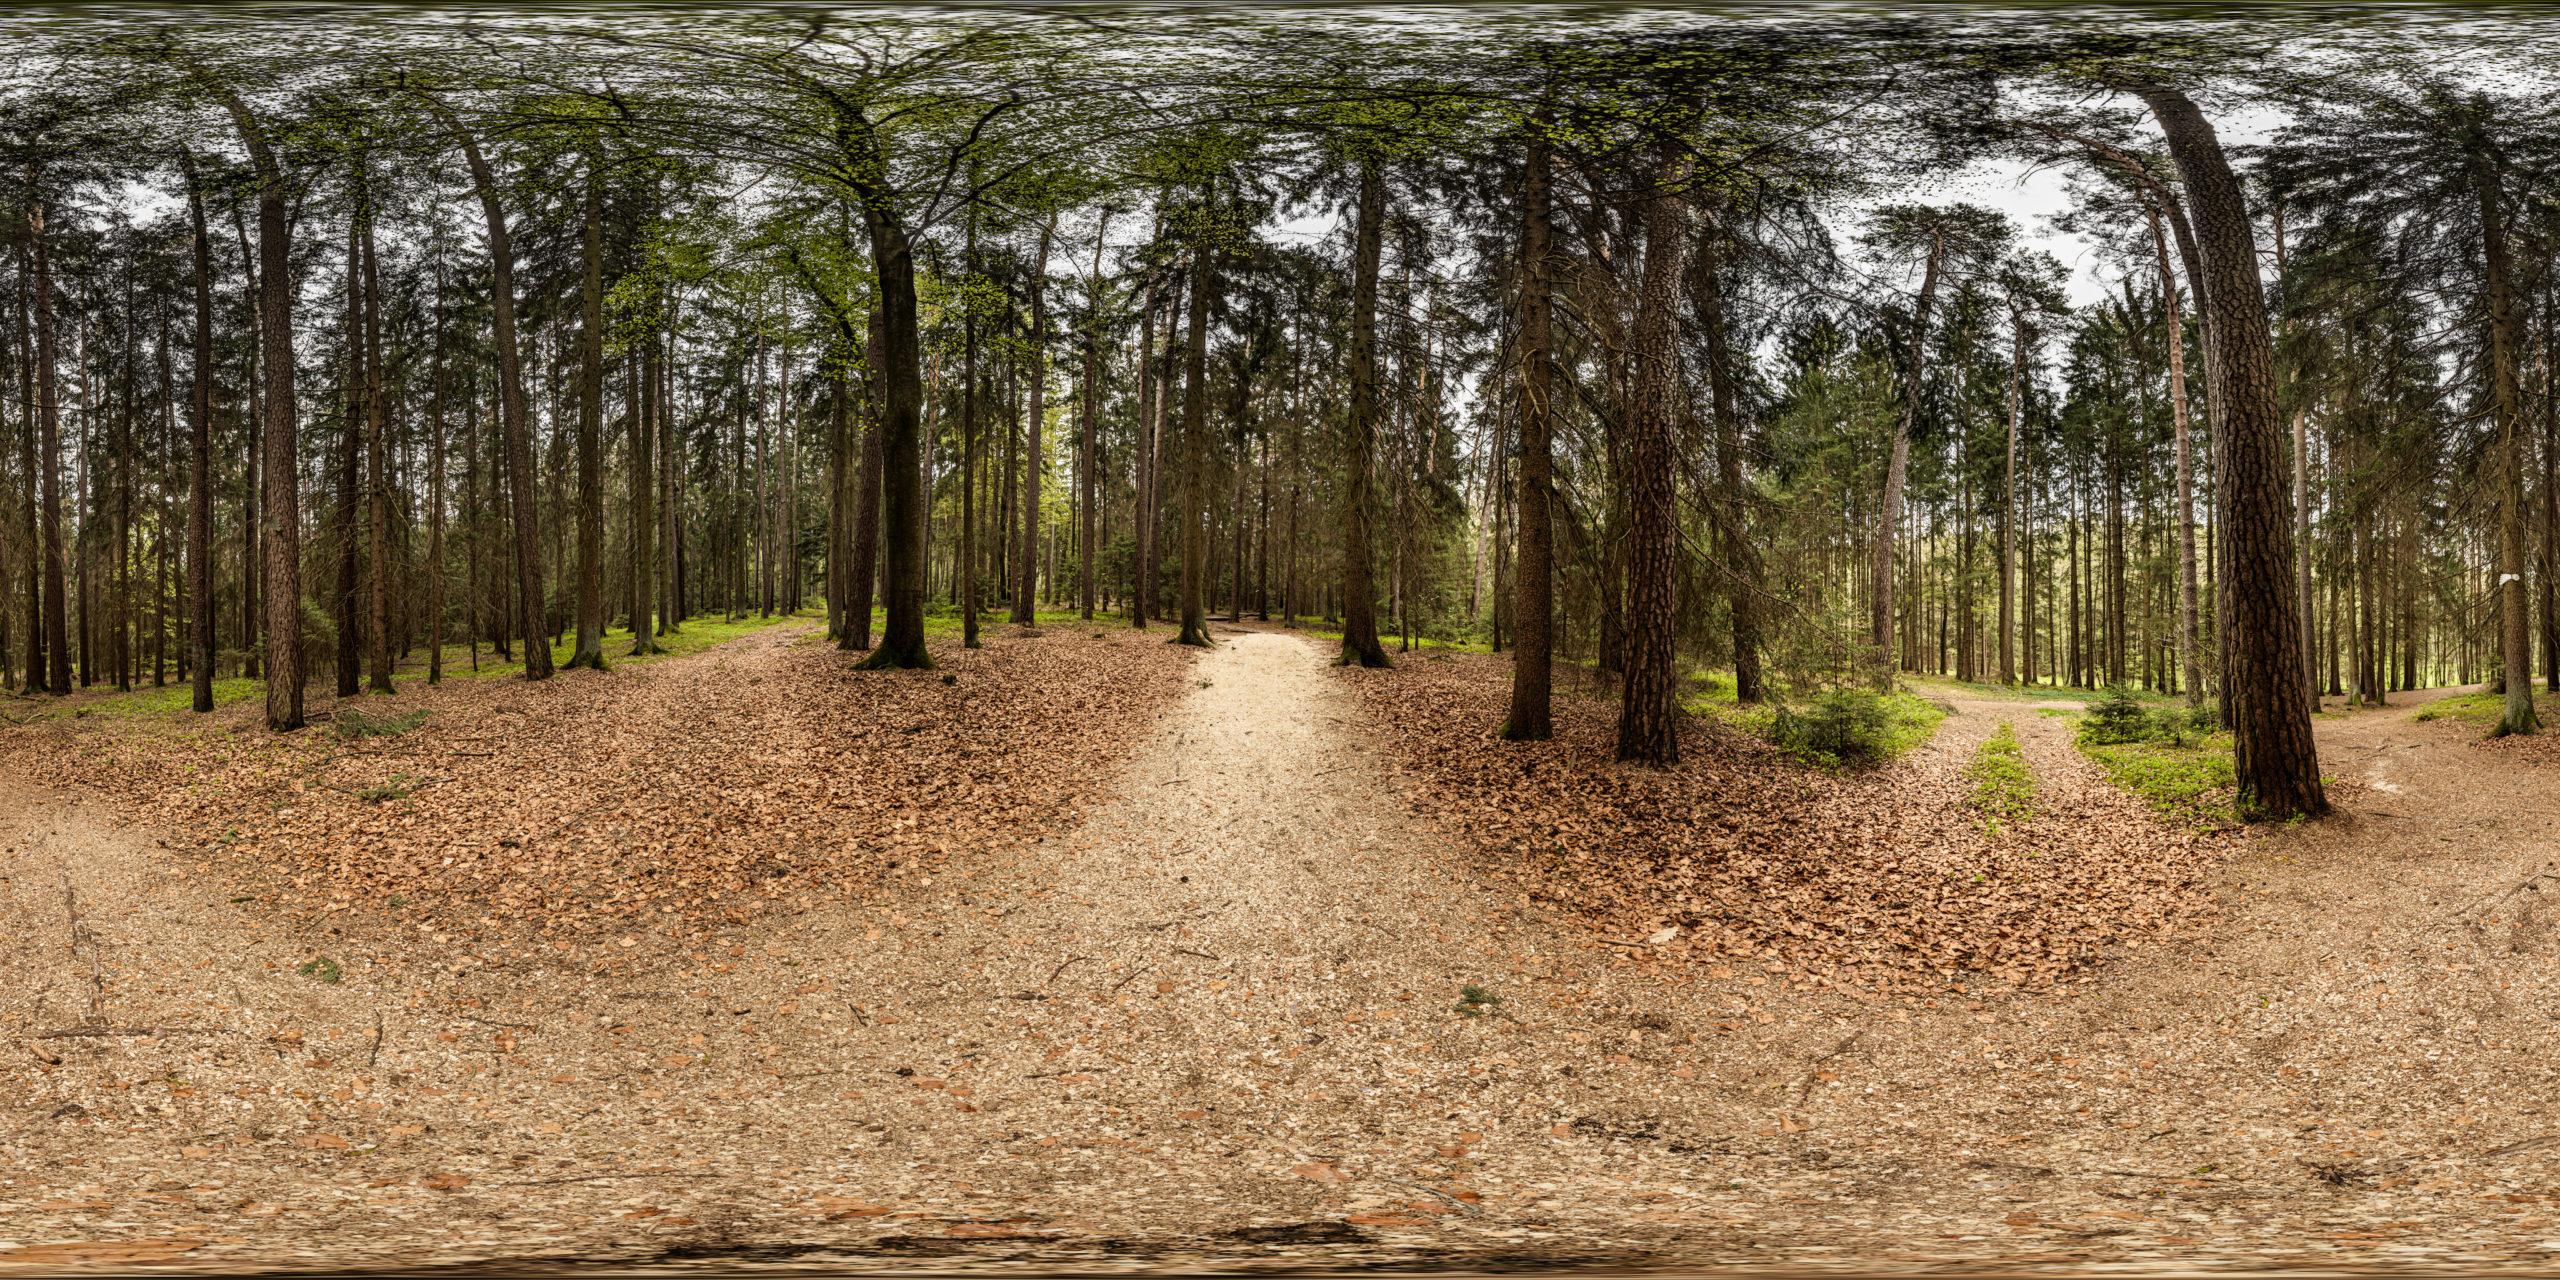 HDRI-Skies-Barefoot-Trail-Crossing-Brombachsee